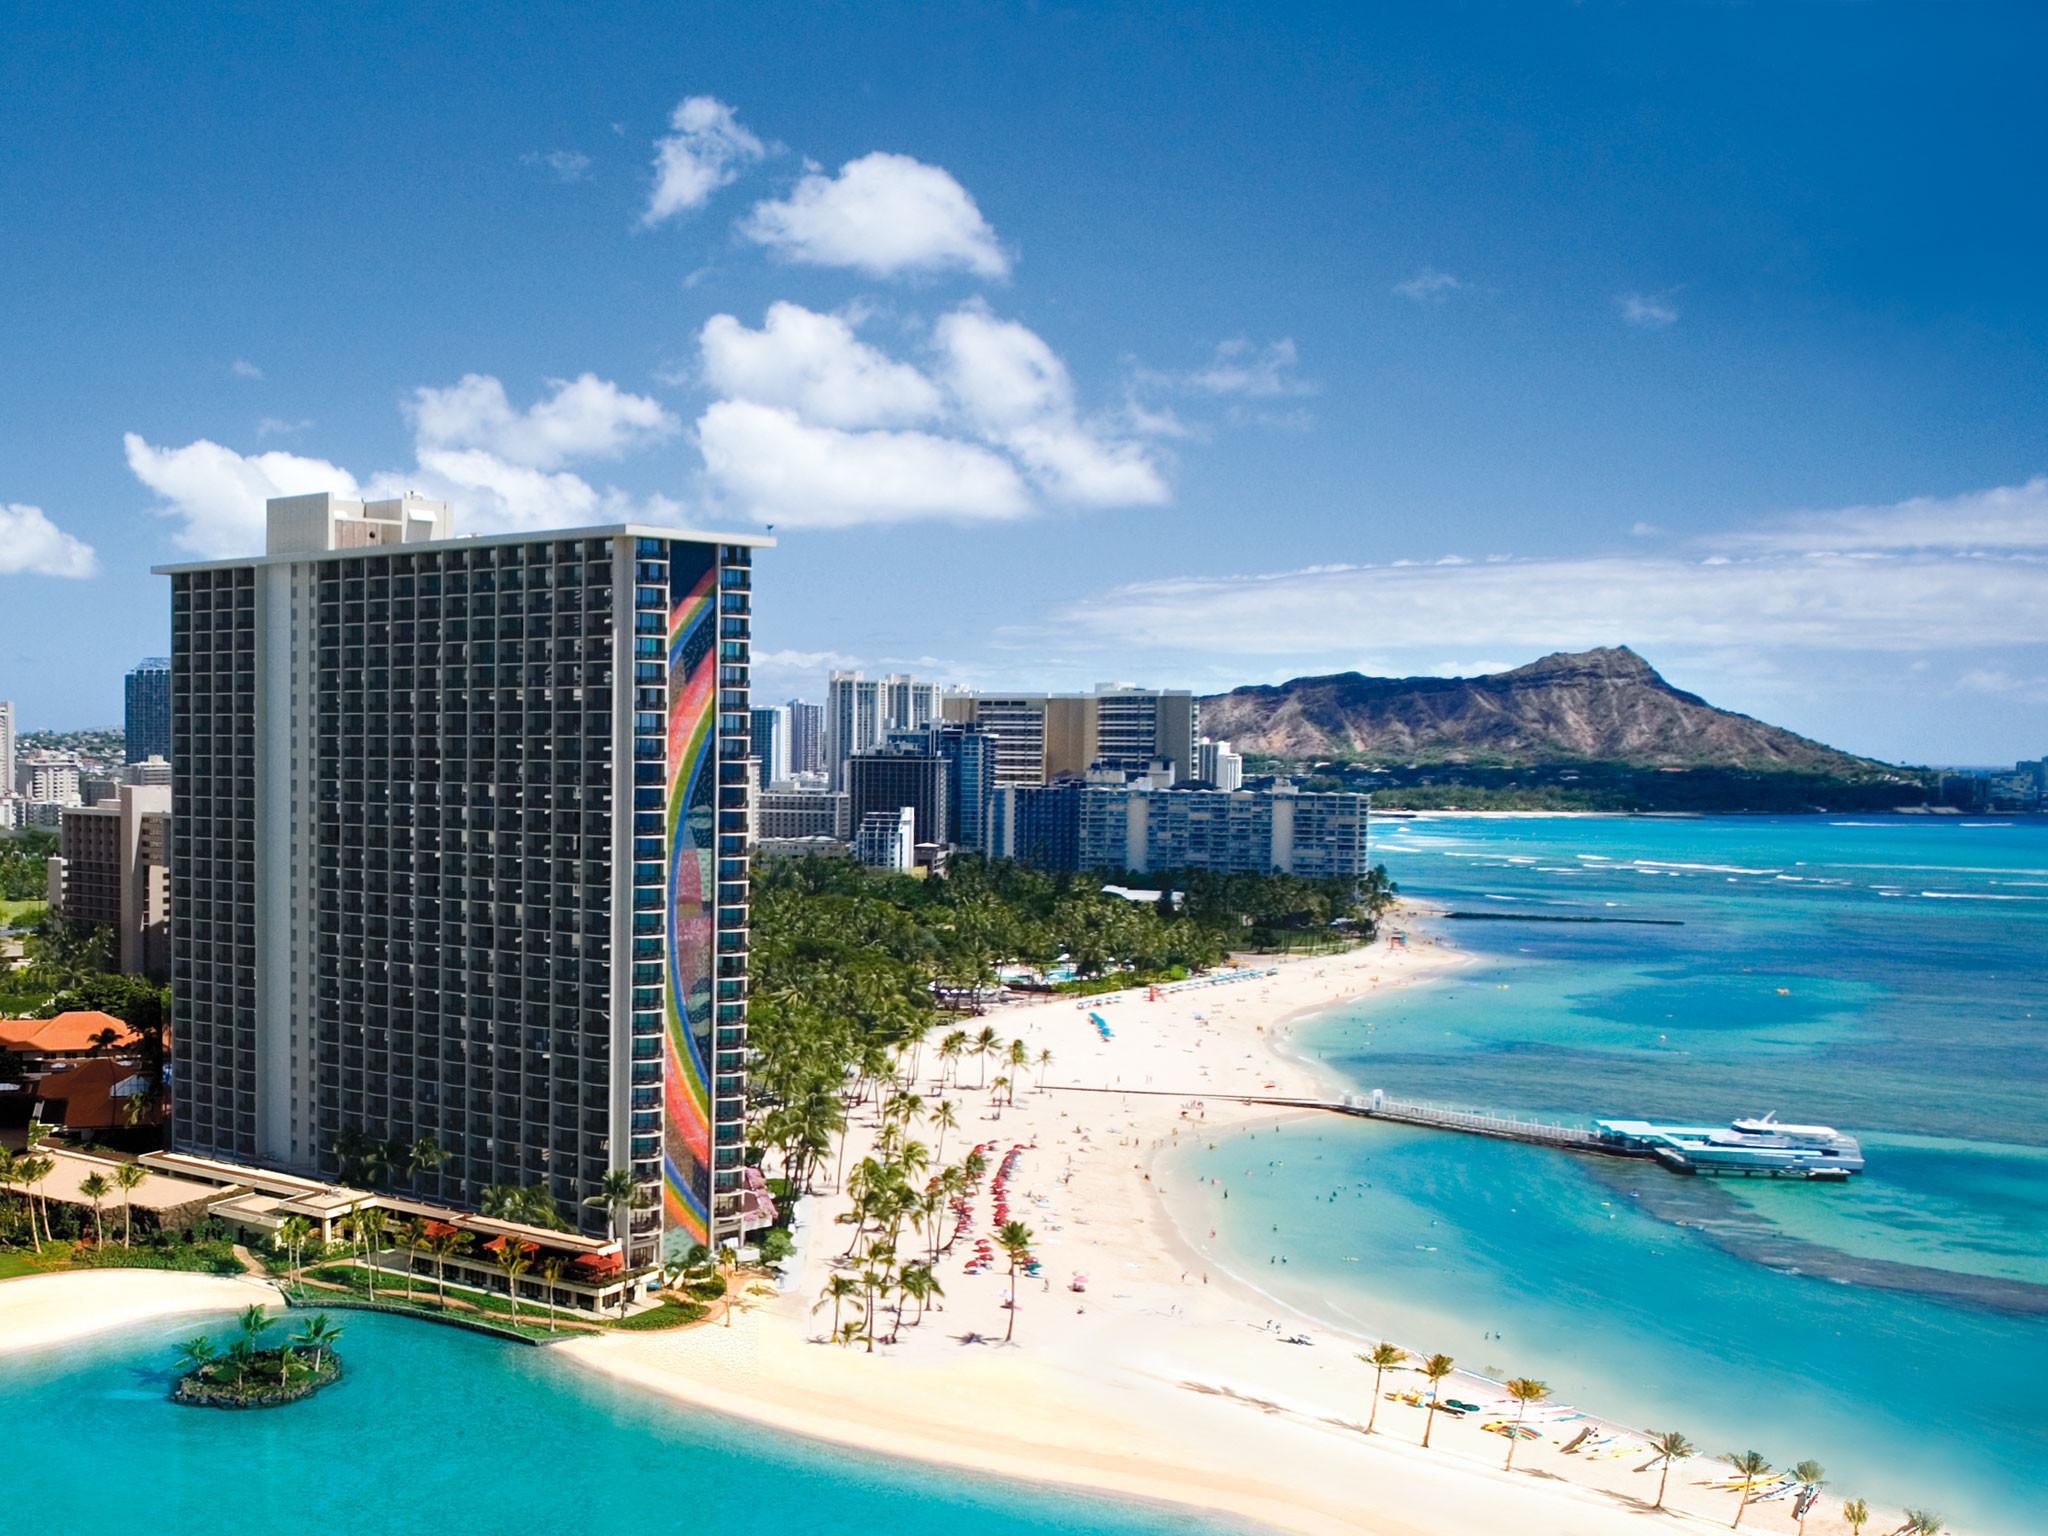 61 Waikiki Beach Wallpapers on WallpaperPlay 2048x1536